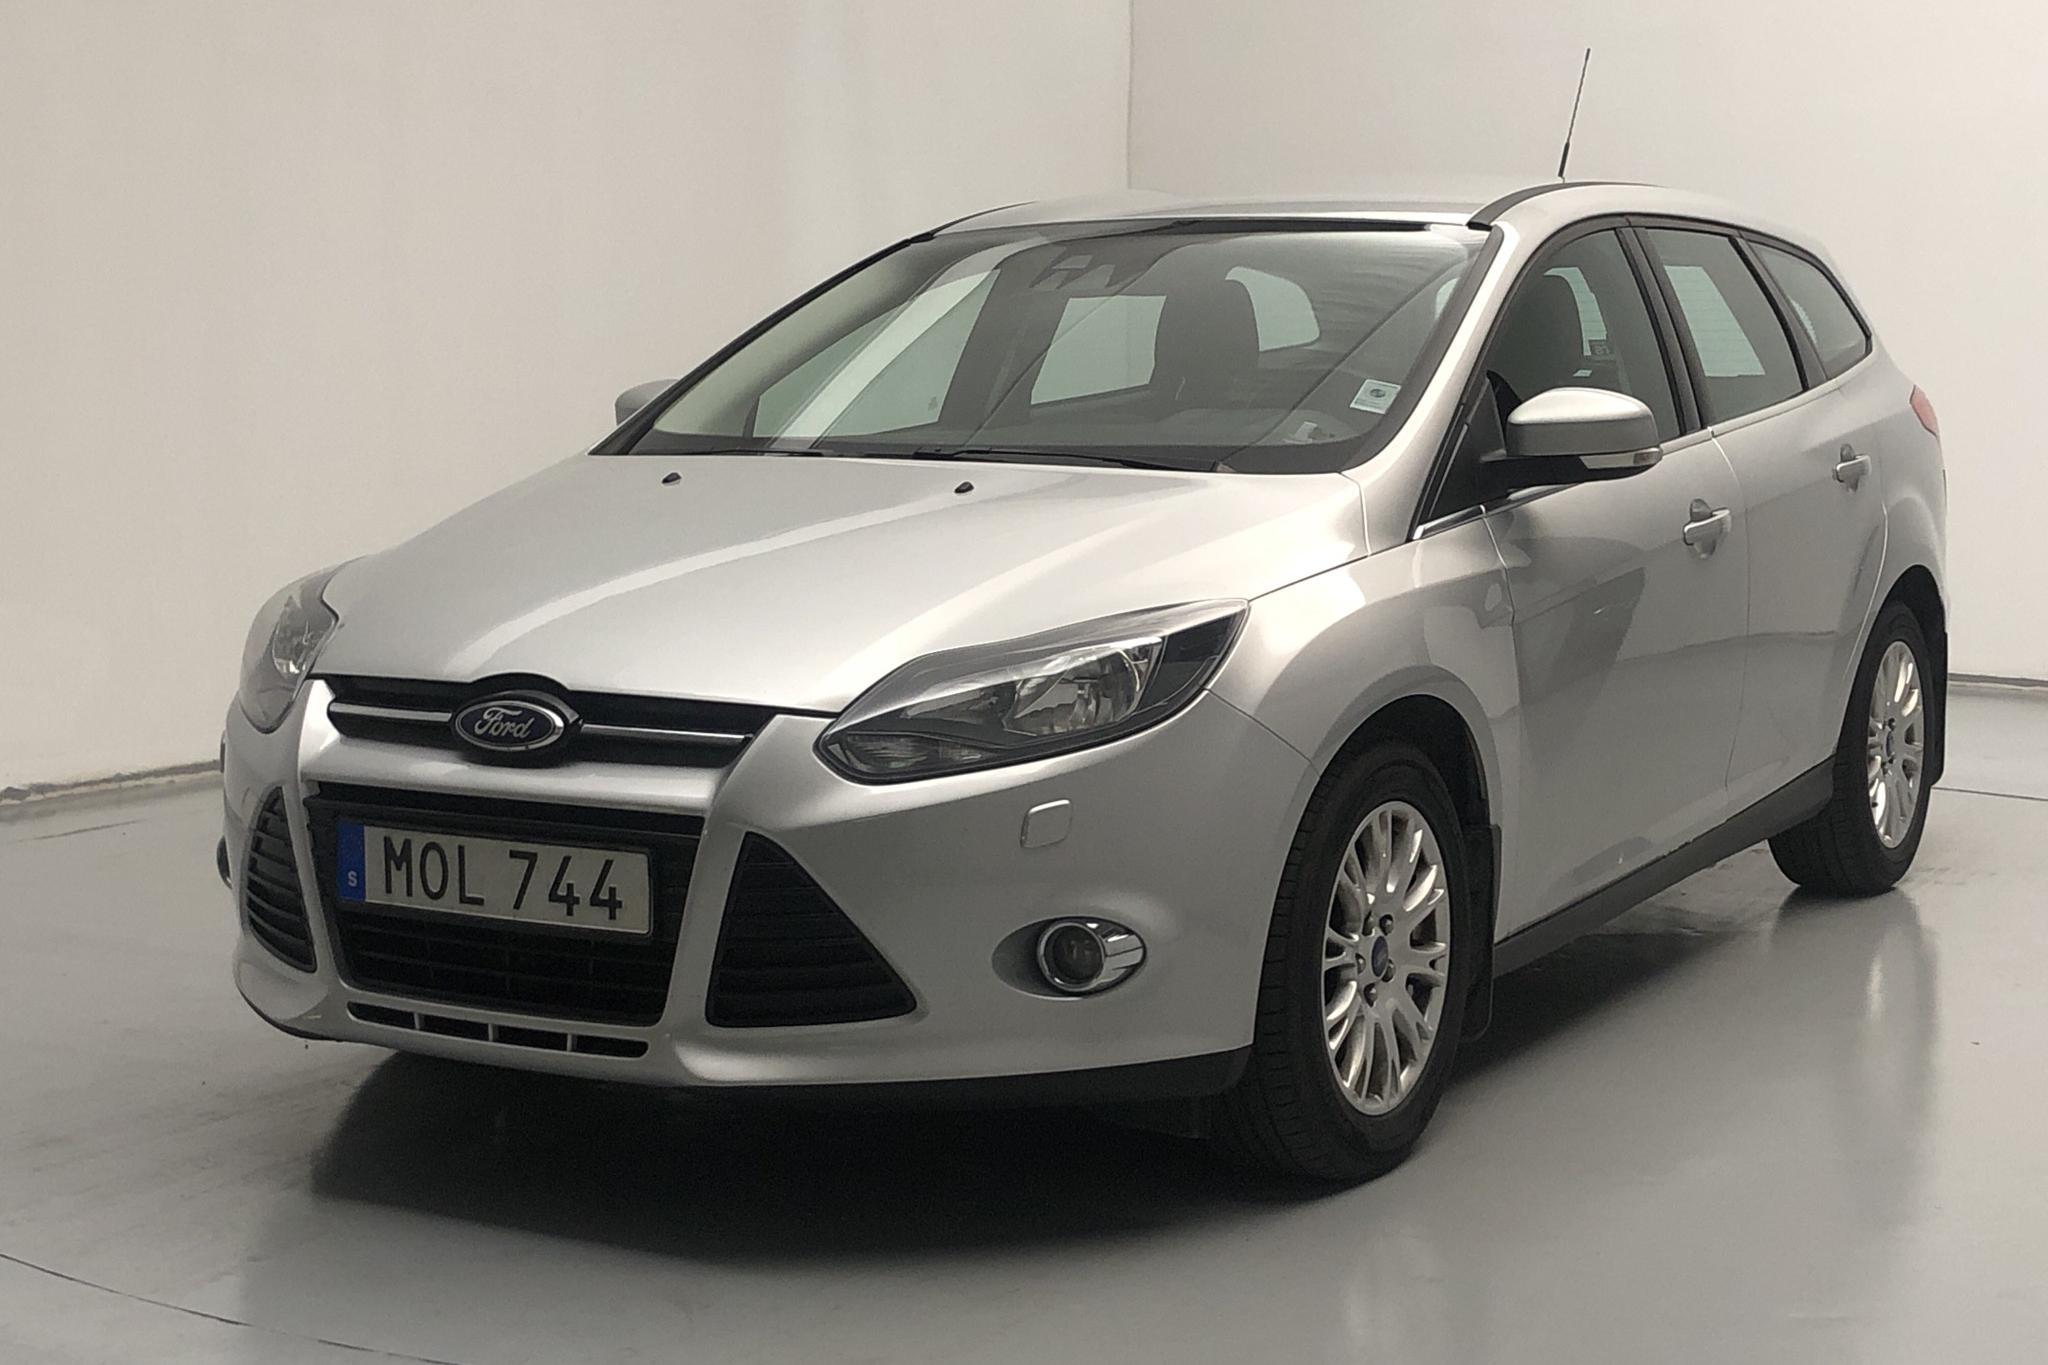 Ford Focus 1.6 Flexifuel Kombi (150hk)